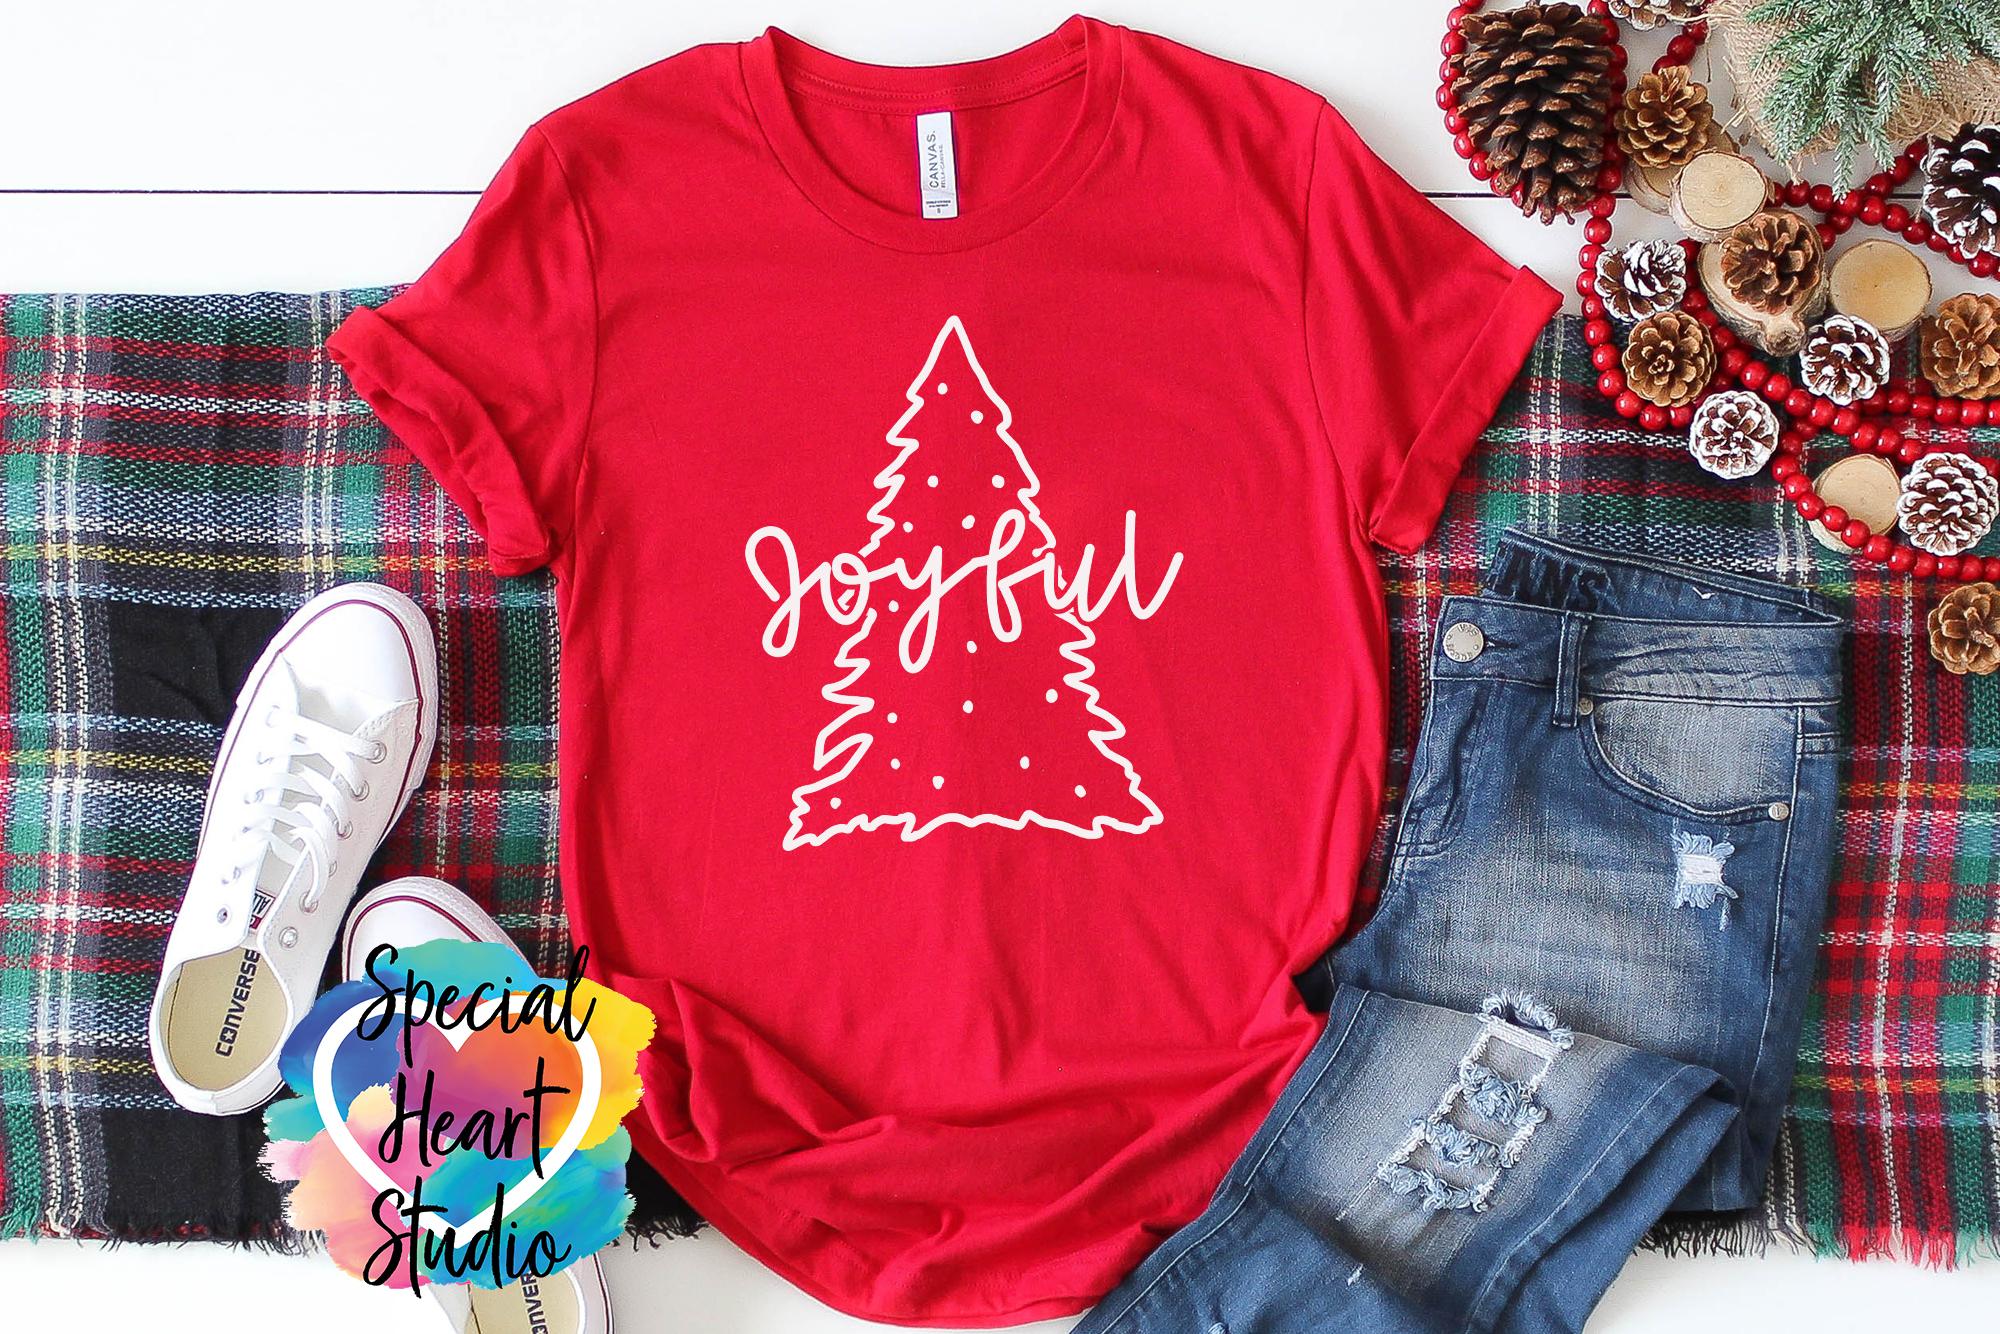 Christmas SVG Bundle - A Christmas Shirt SVG Cut File Bundle example image 2